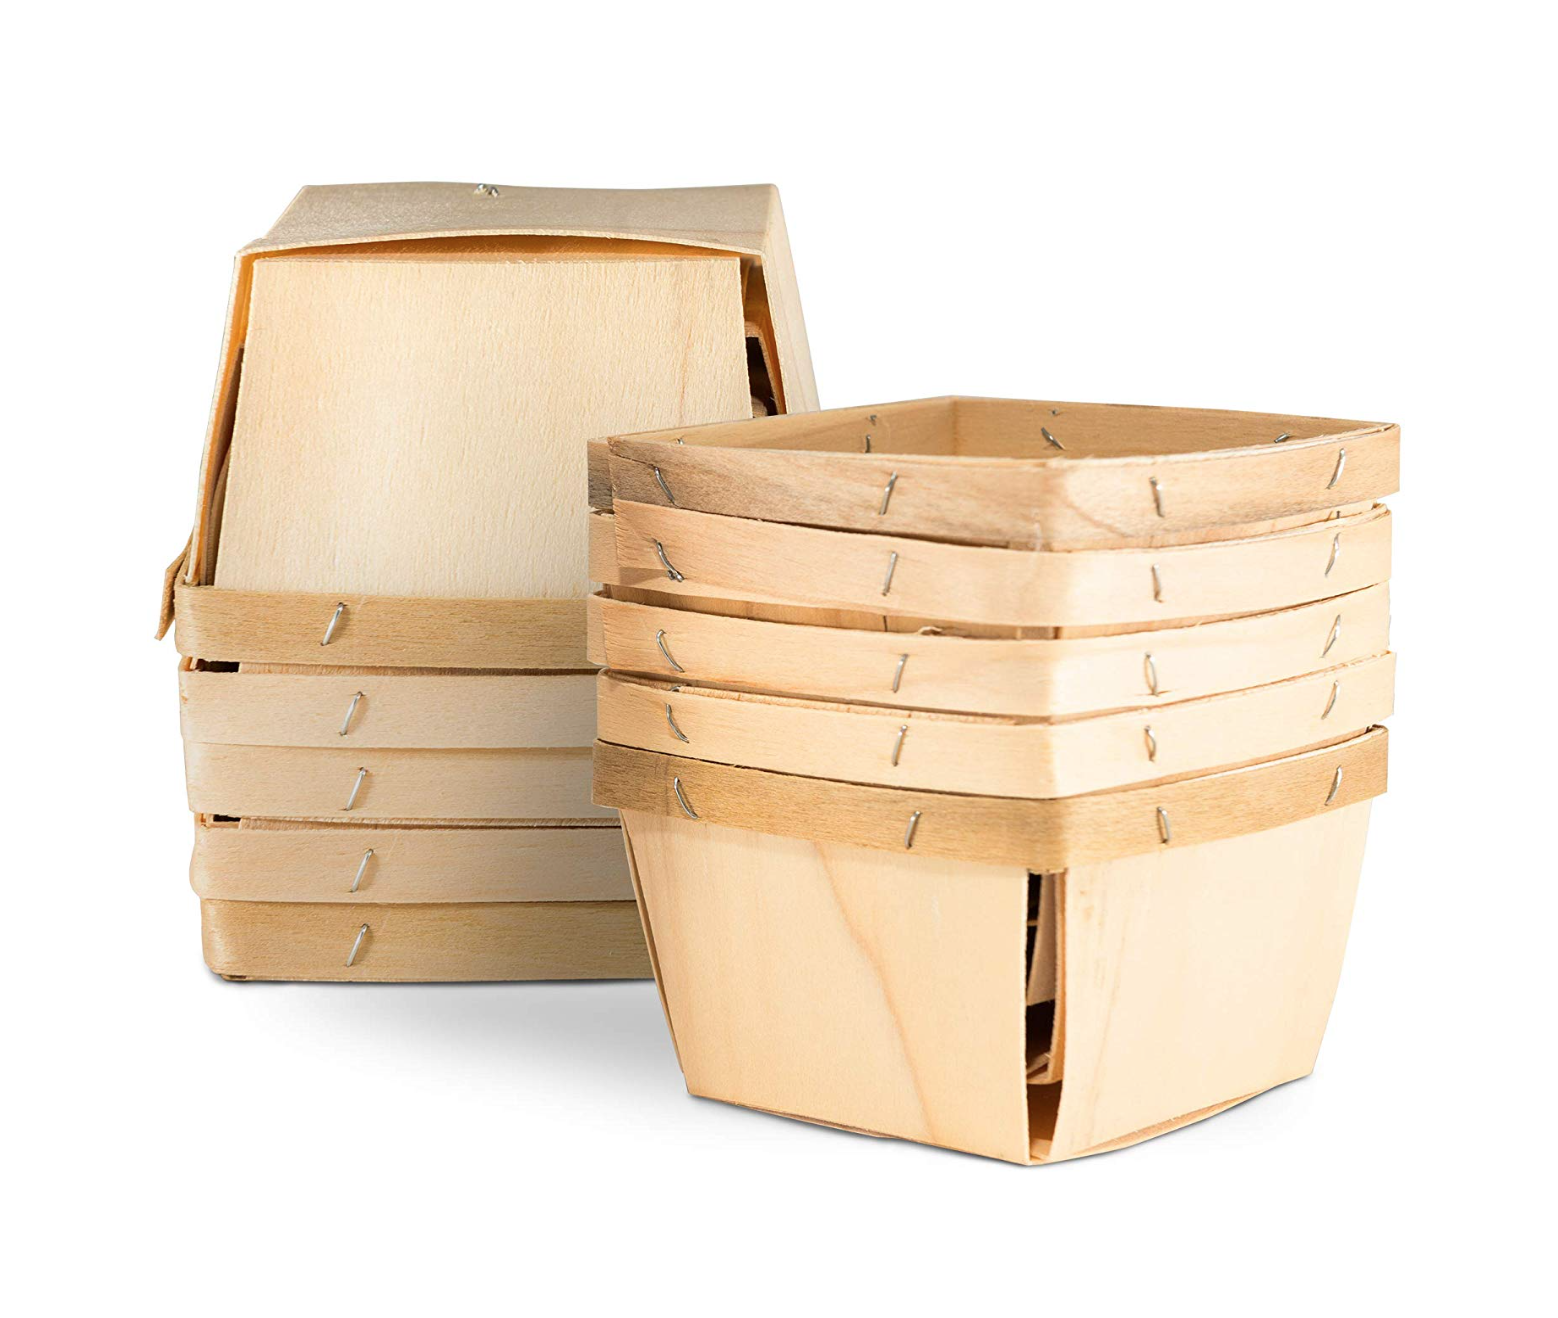 Wooden Berry Baskets